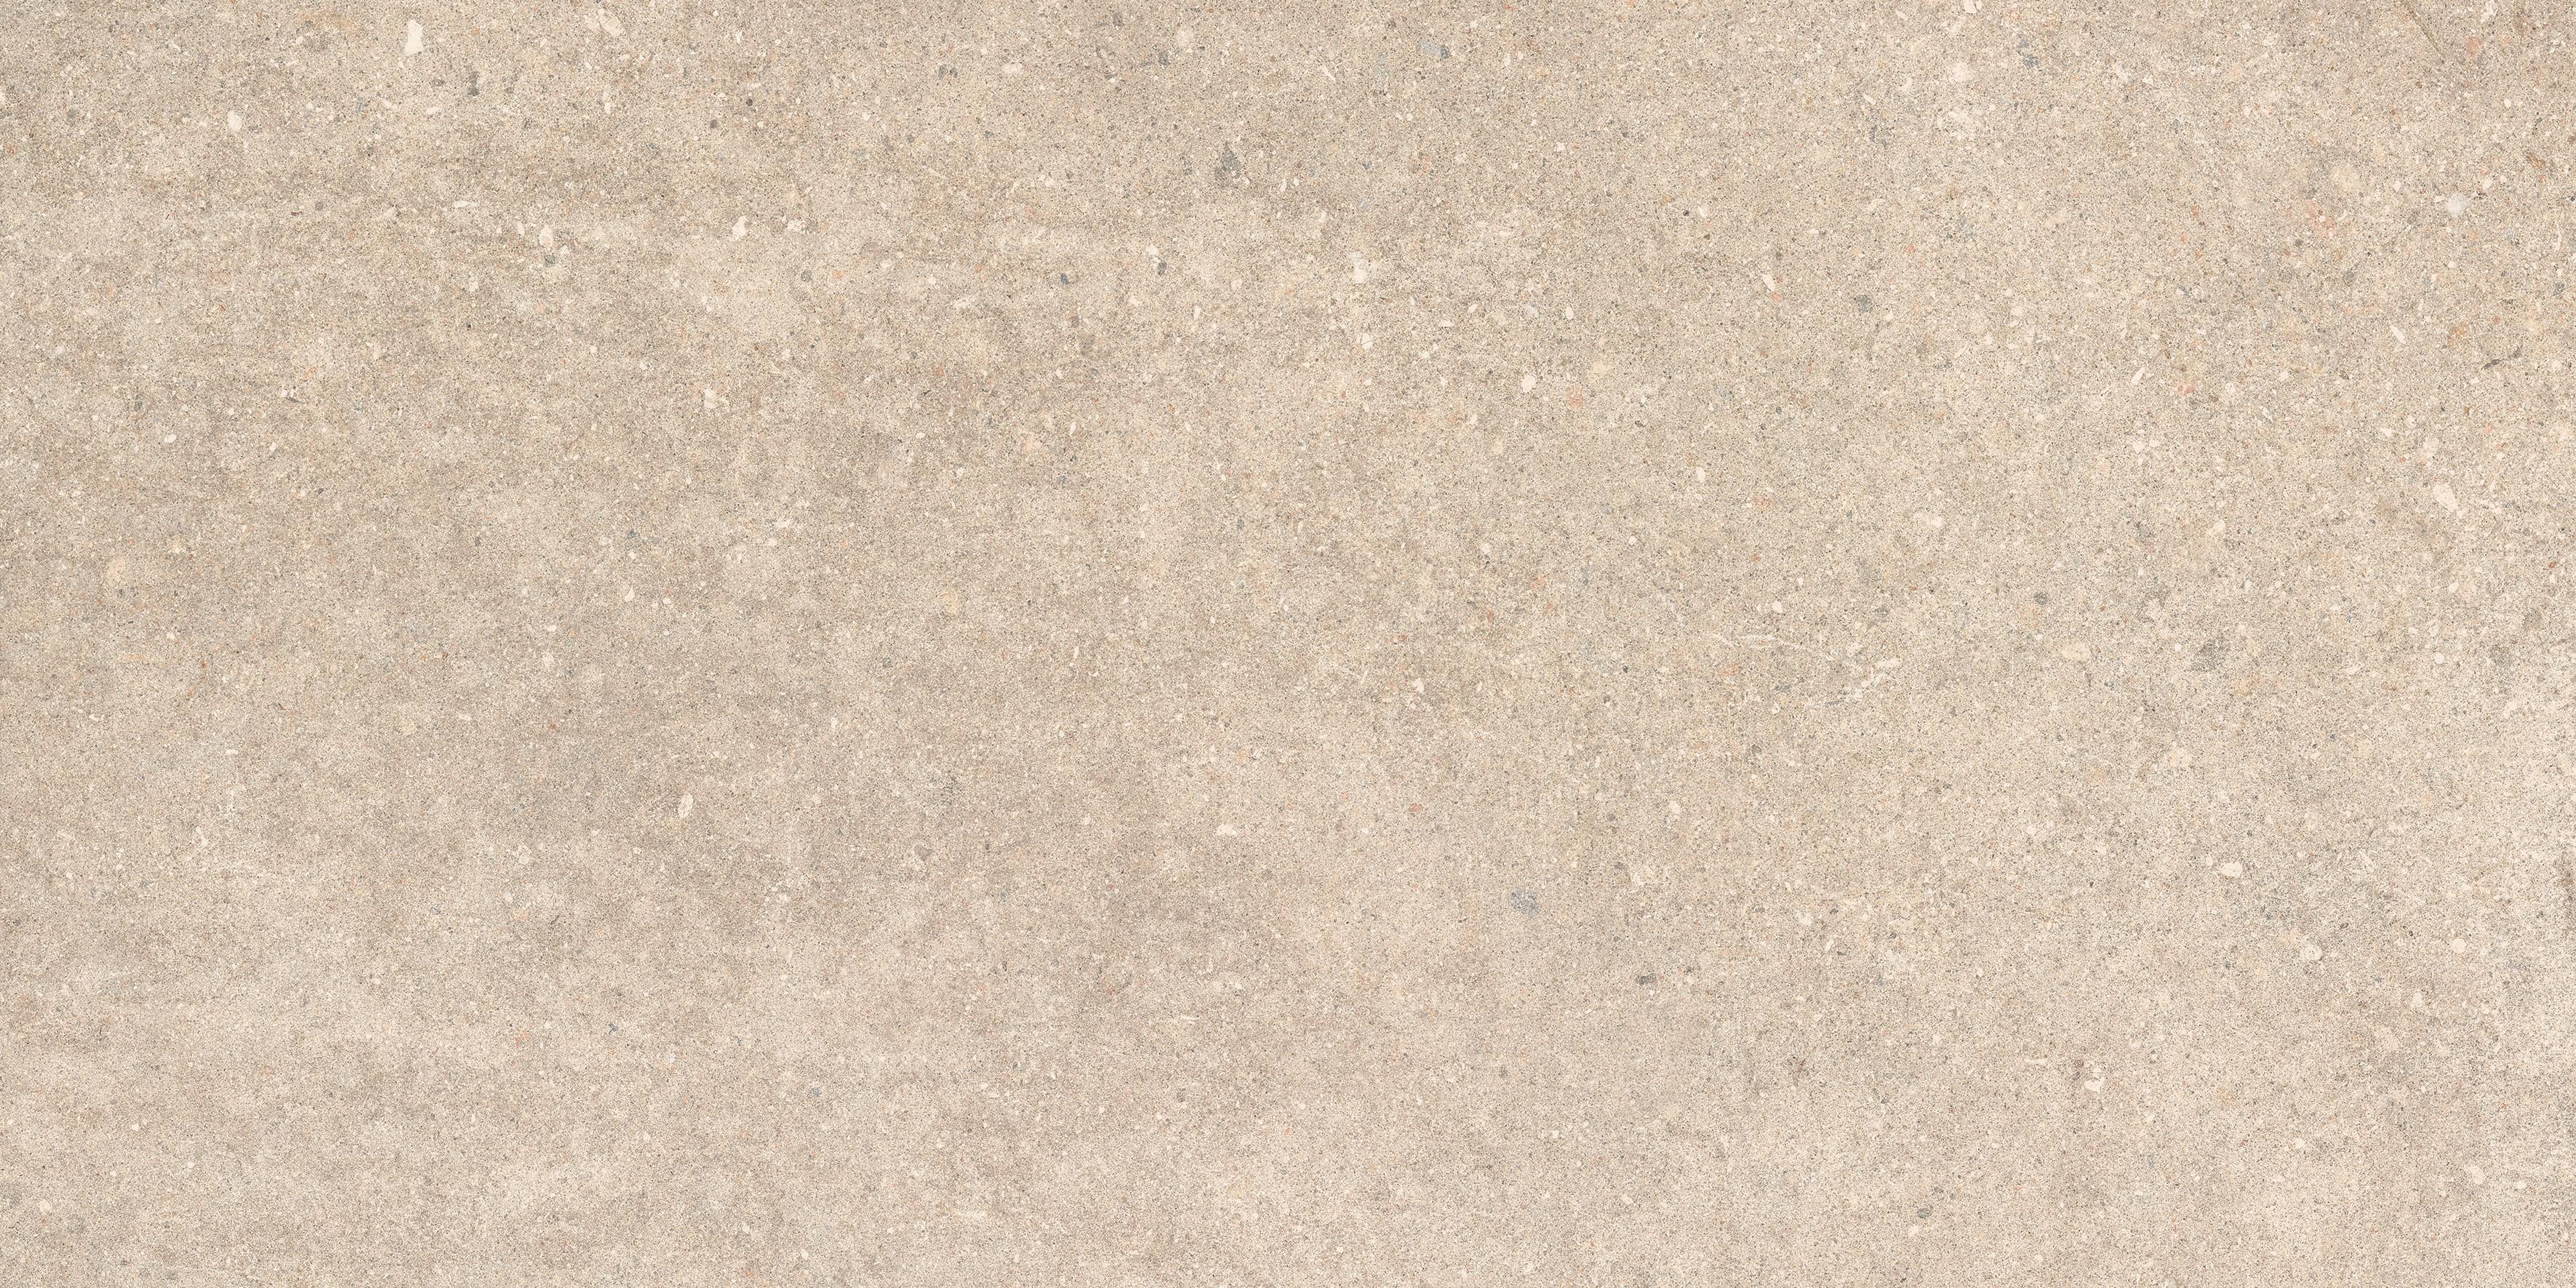 Плитка керамограніт CONCRETE 30x60 SABBIA ZNXRM3AR